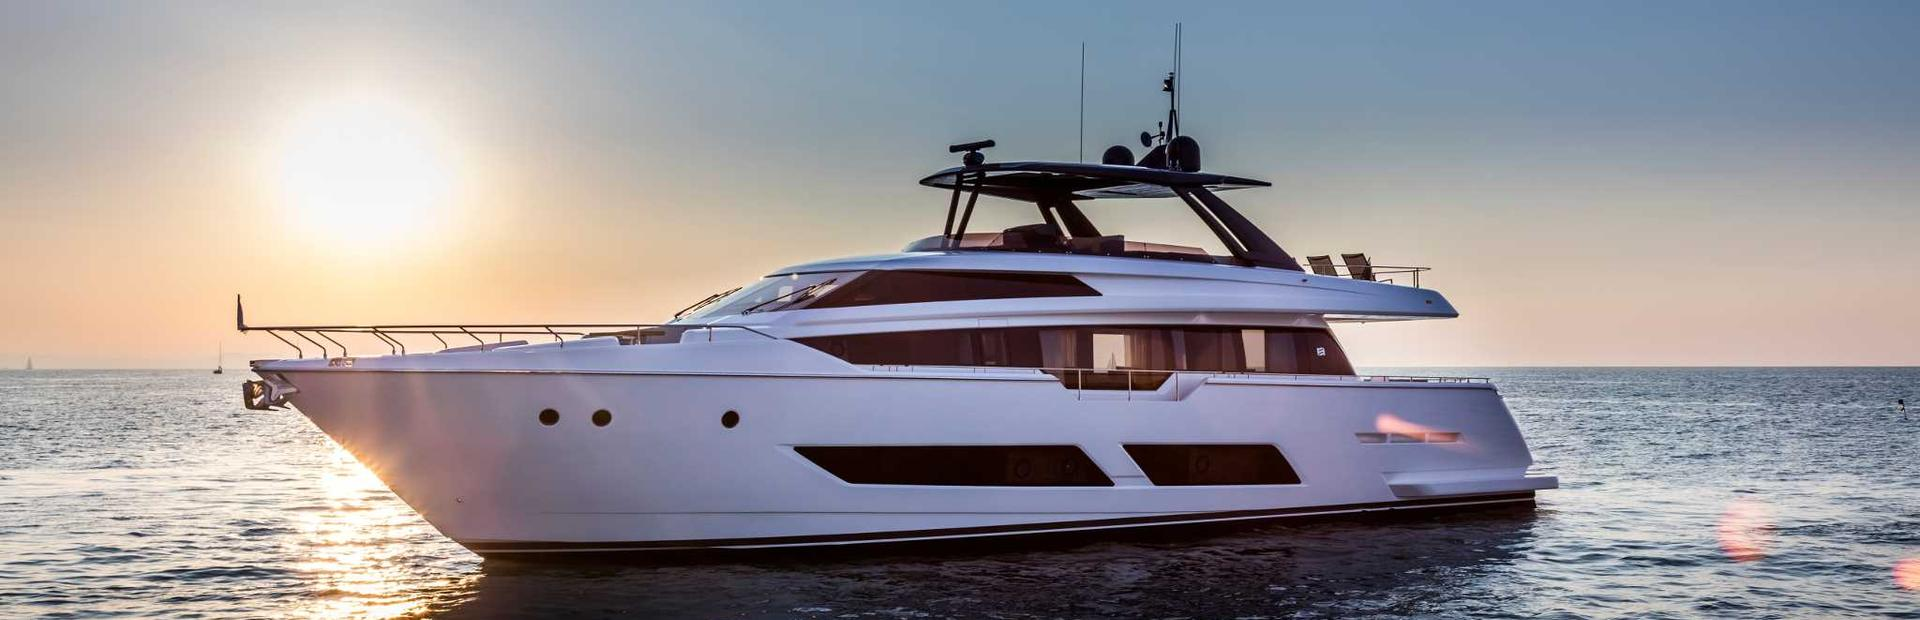 Ferretti Yachts 850 Yacht Charter